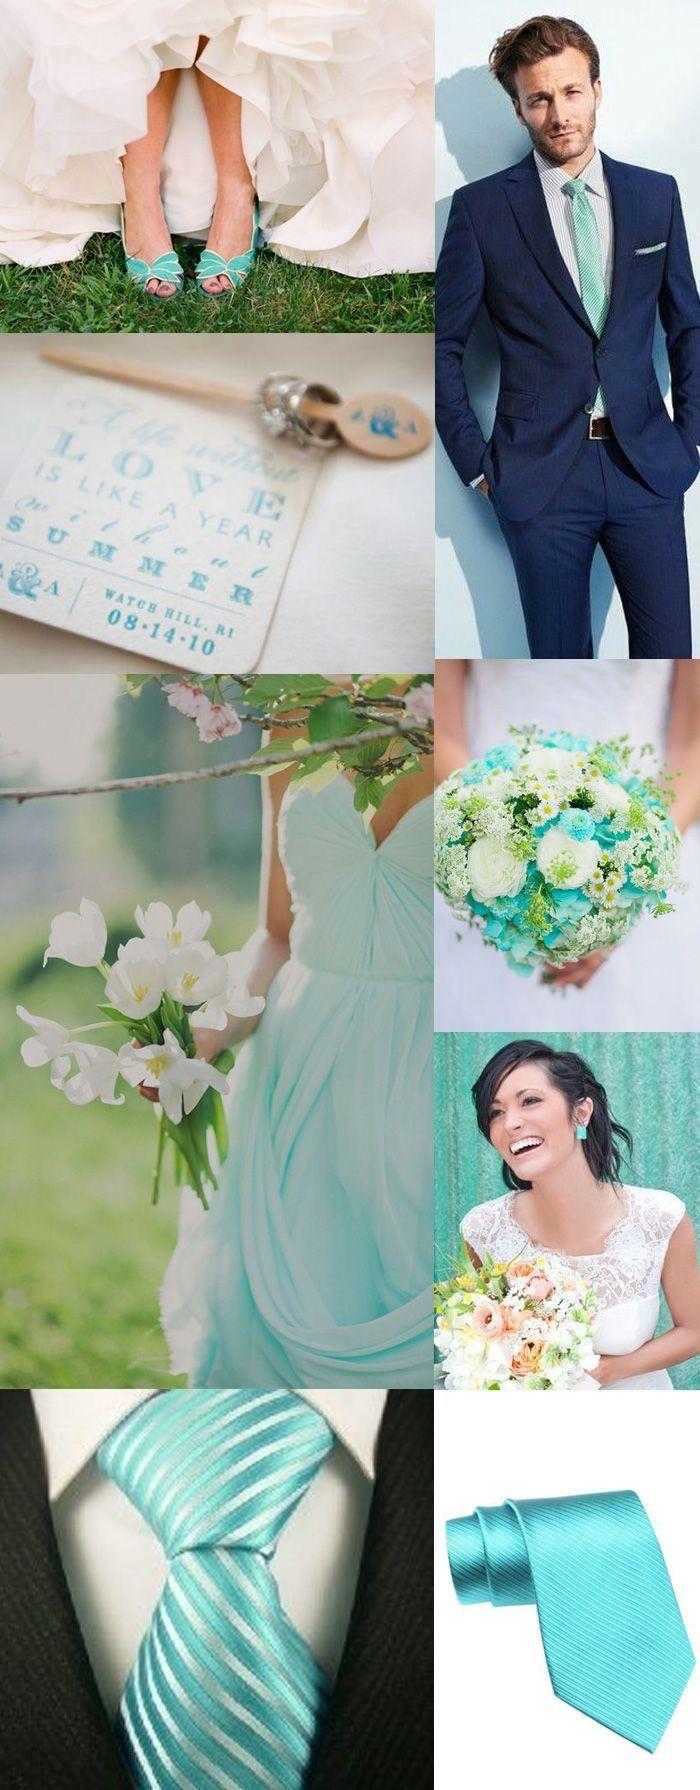 Navy suits | Katie | Pinterest | Wedding, Wedding and Wedding stuff